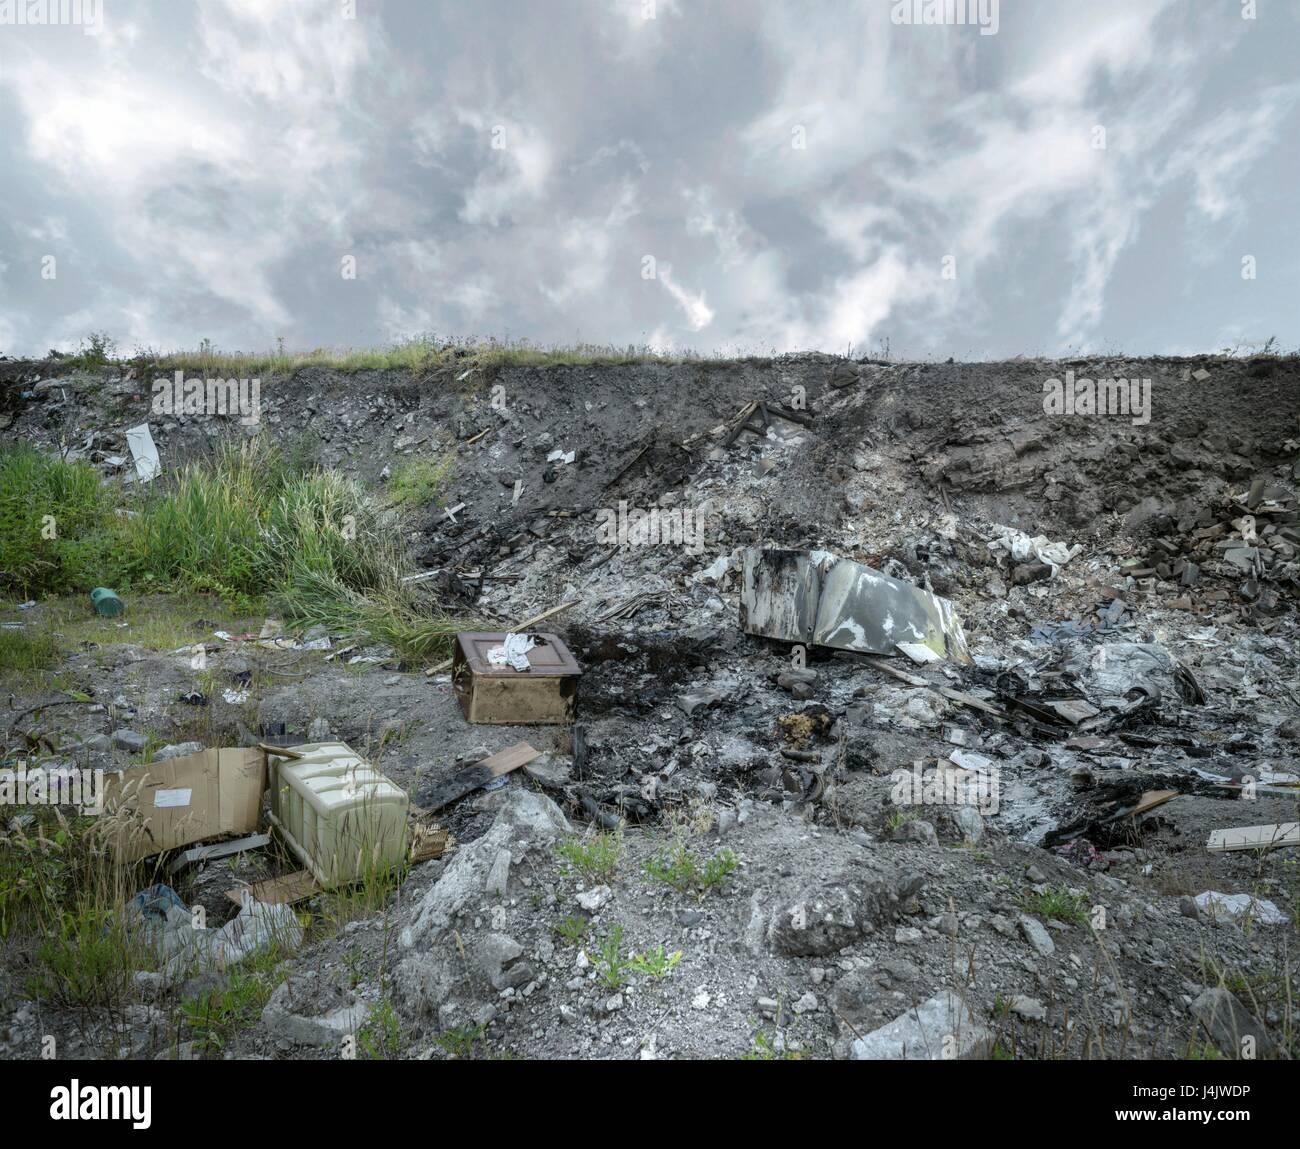 Abbandonati i terreni industriali. Immagini Stock